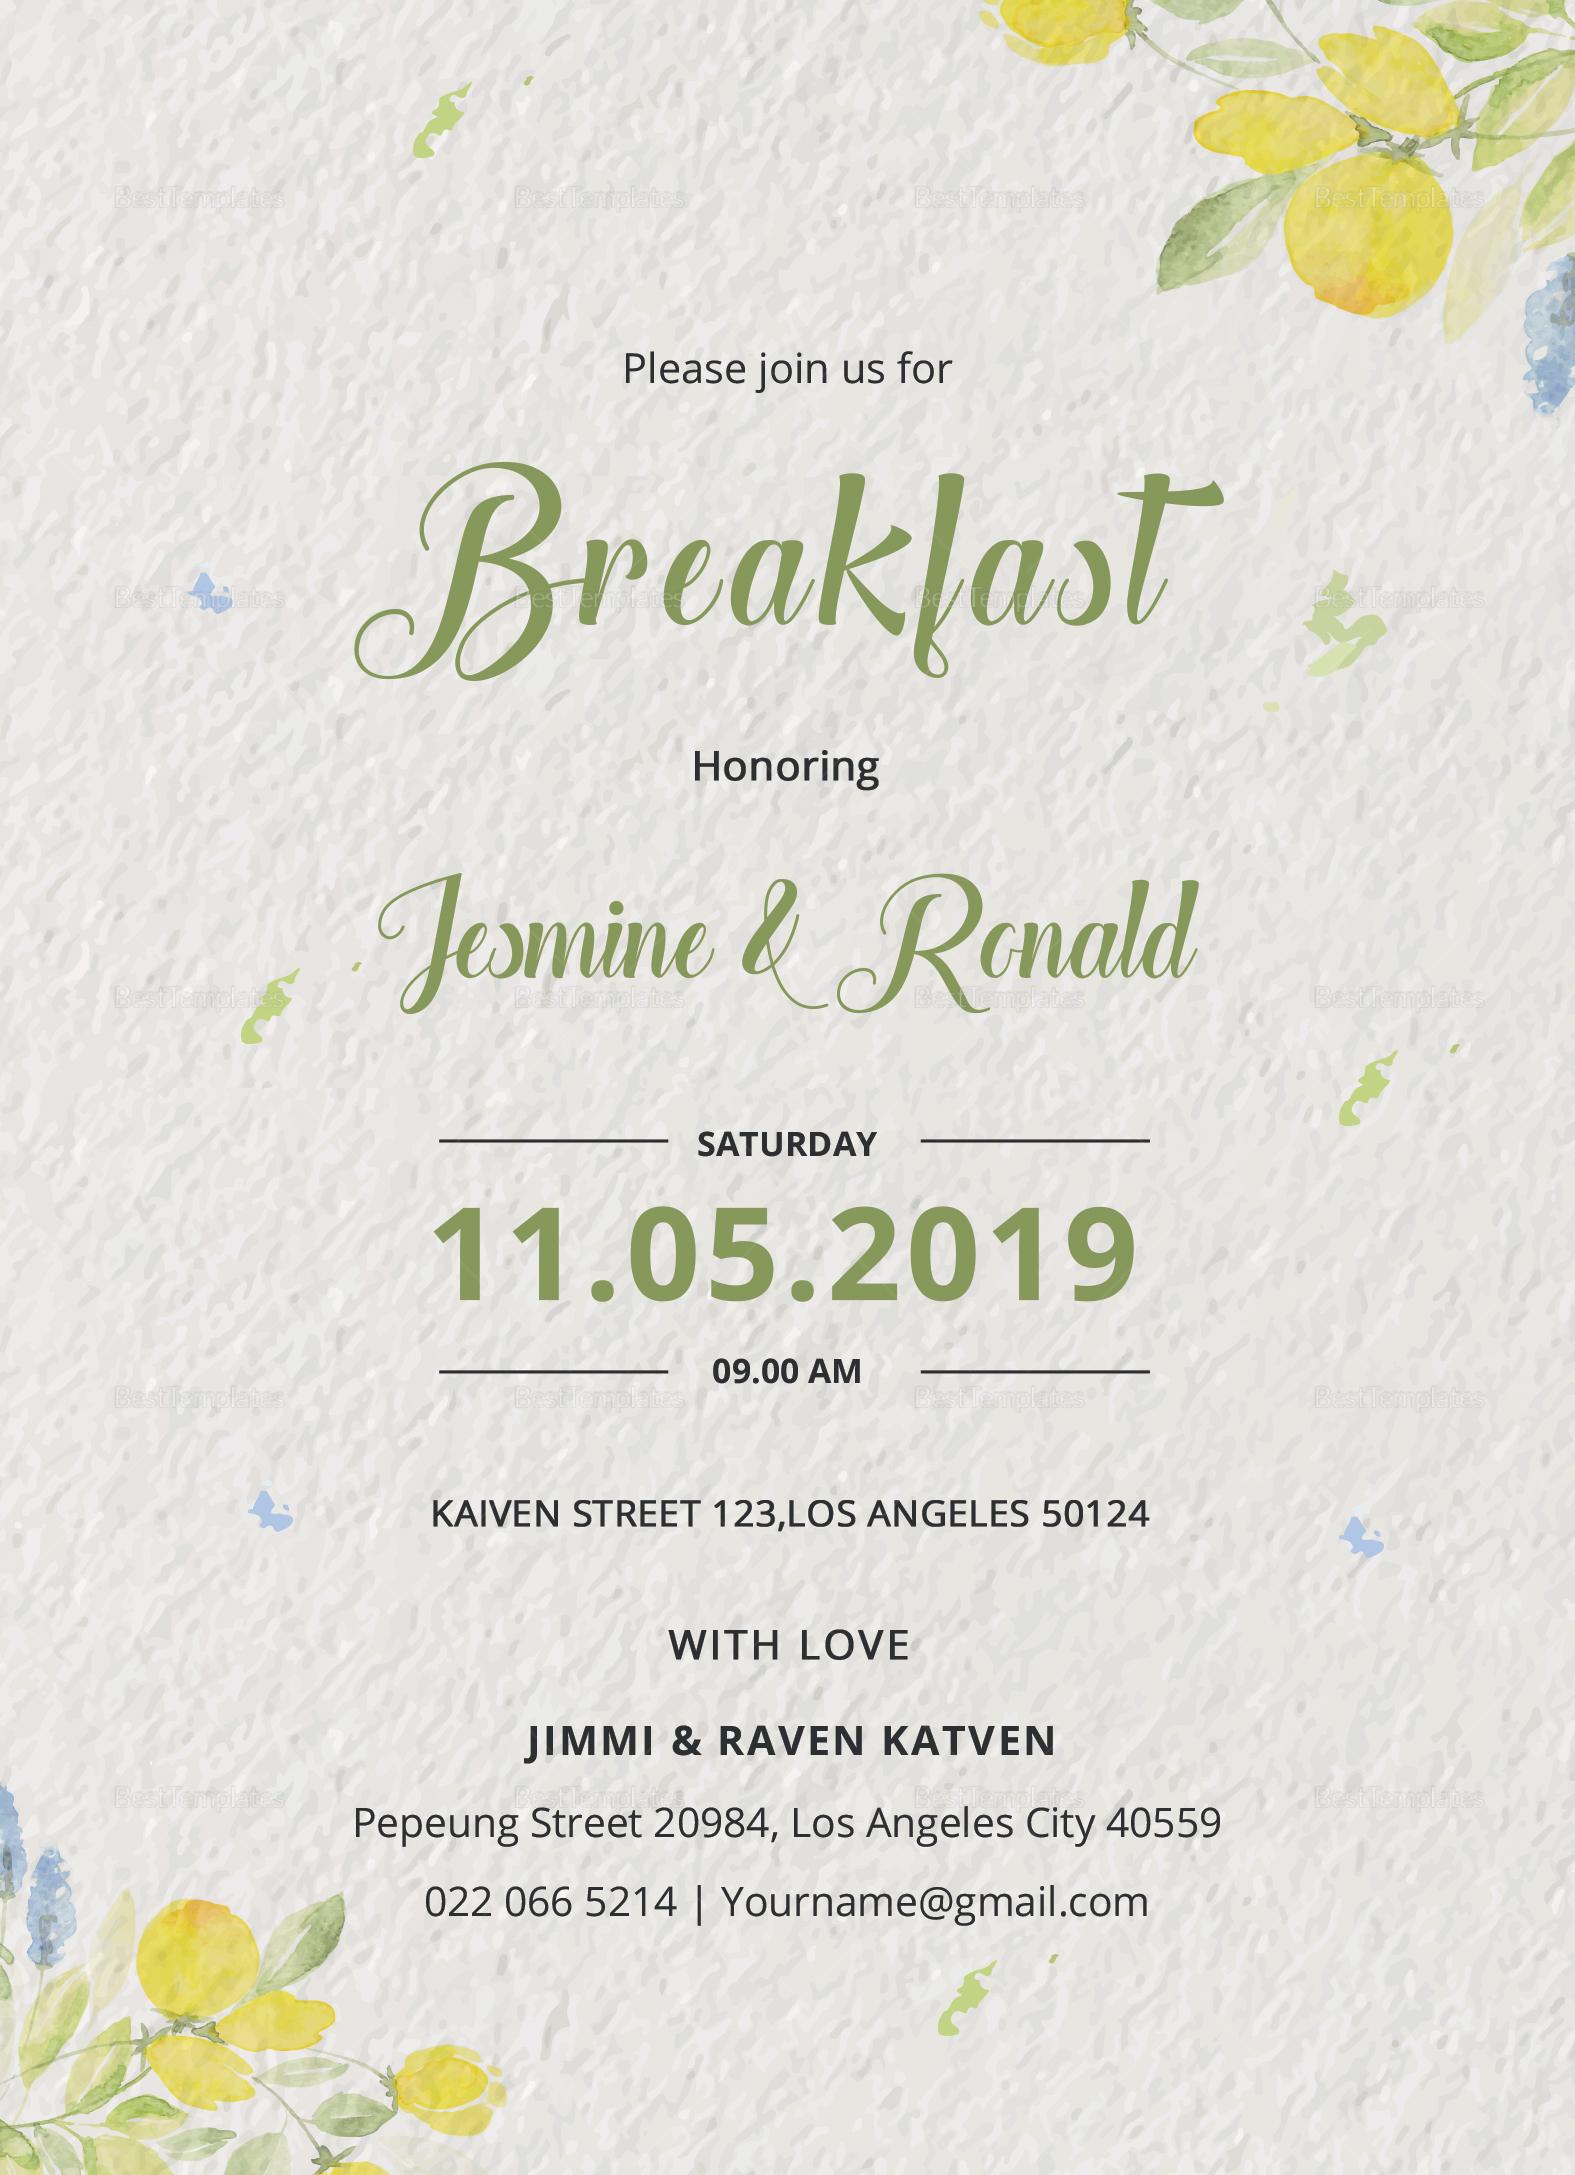 Breakfast Invitation Design Template